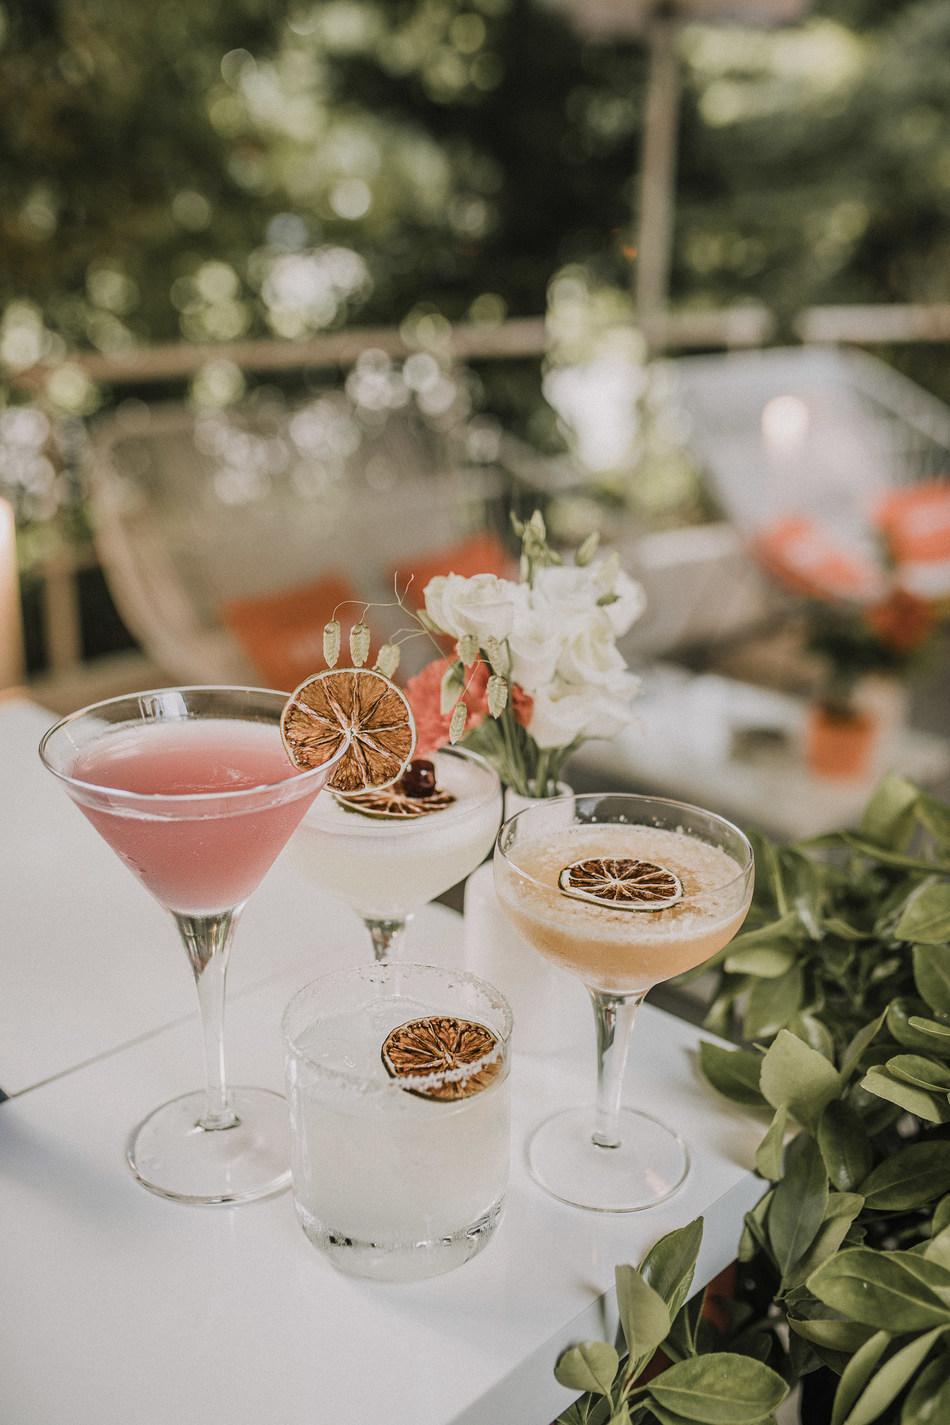 Cointreau's four classic cocktails (Cosmopolitan, White Lady, Margarita and Sidecar) (Cosmopolitan, White Lady, Margarita and Sidecar)